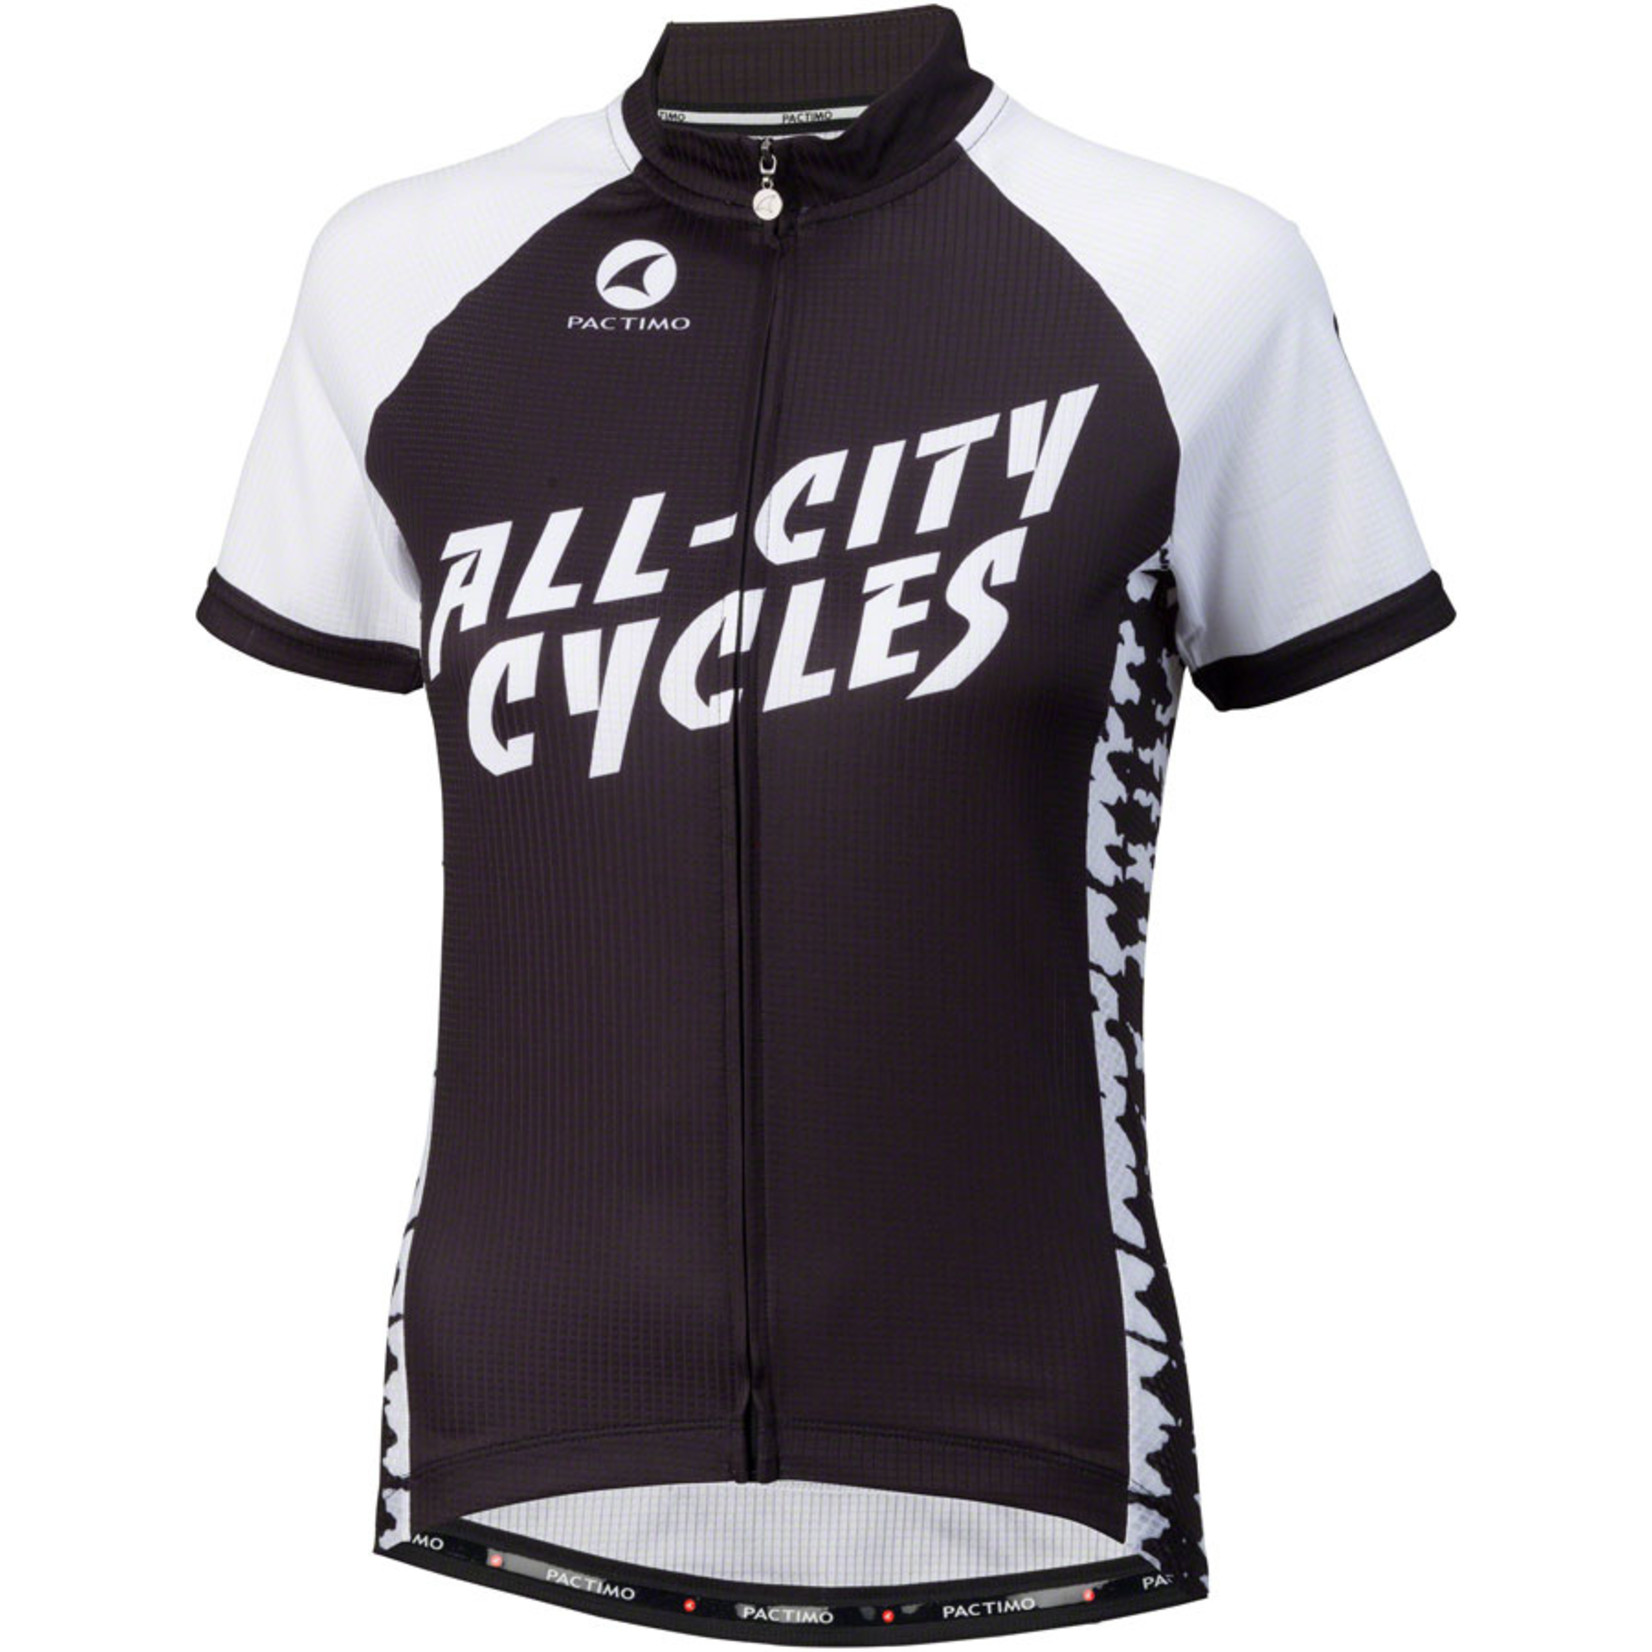 All-City All-City Wangaaa! Jersey - Black/White, Short Sleeve, Women's, X-Small